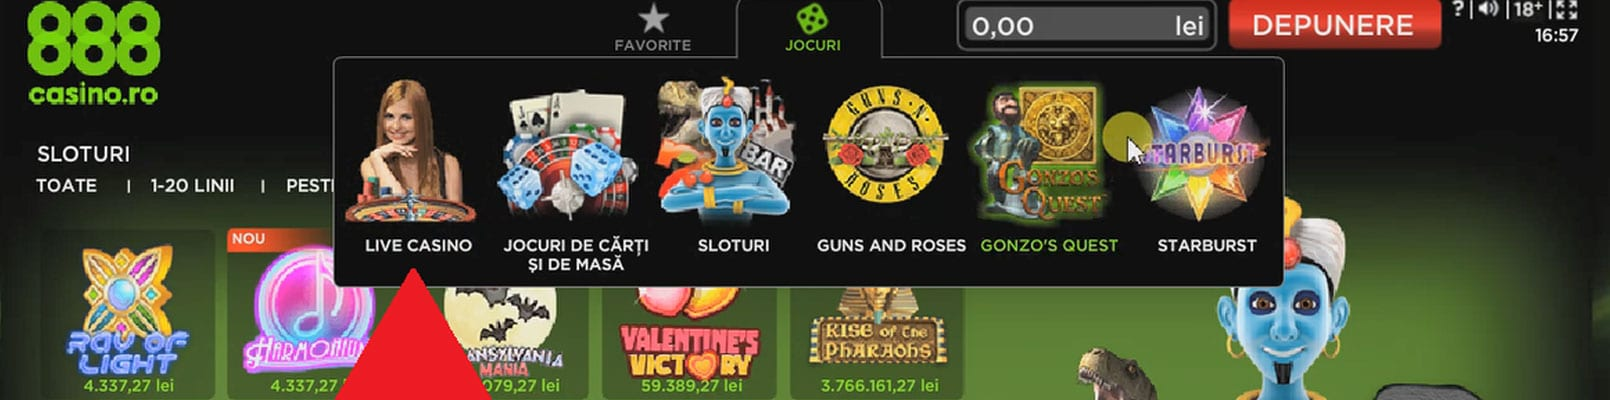 jocuri live casino 888 cu dealeri live